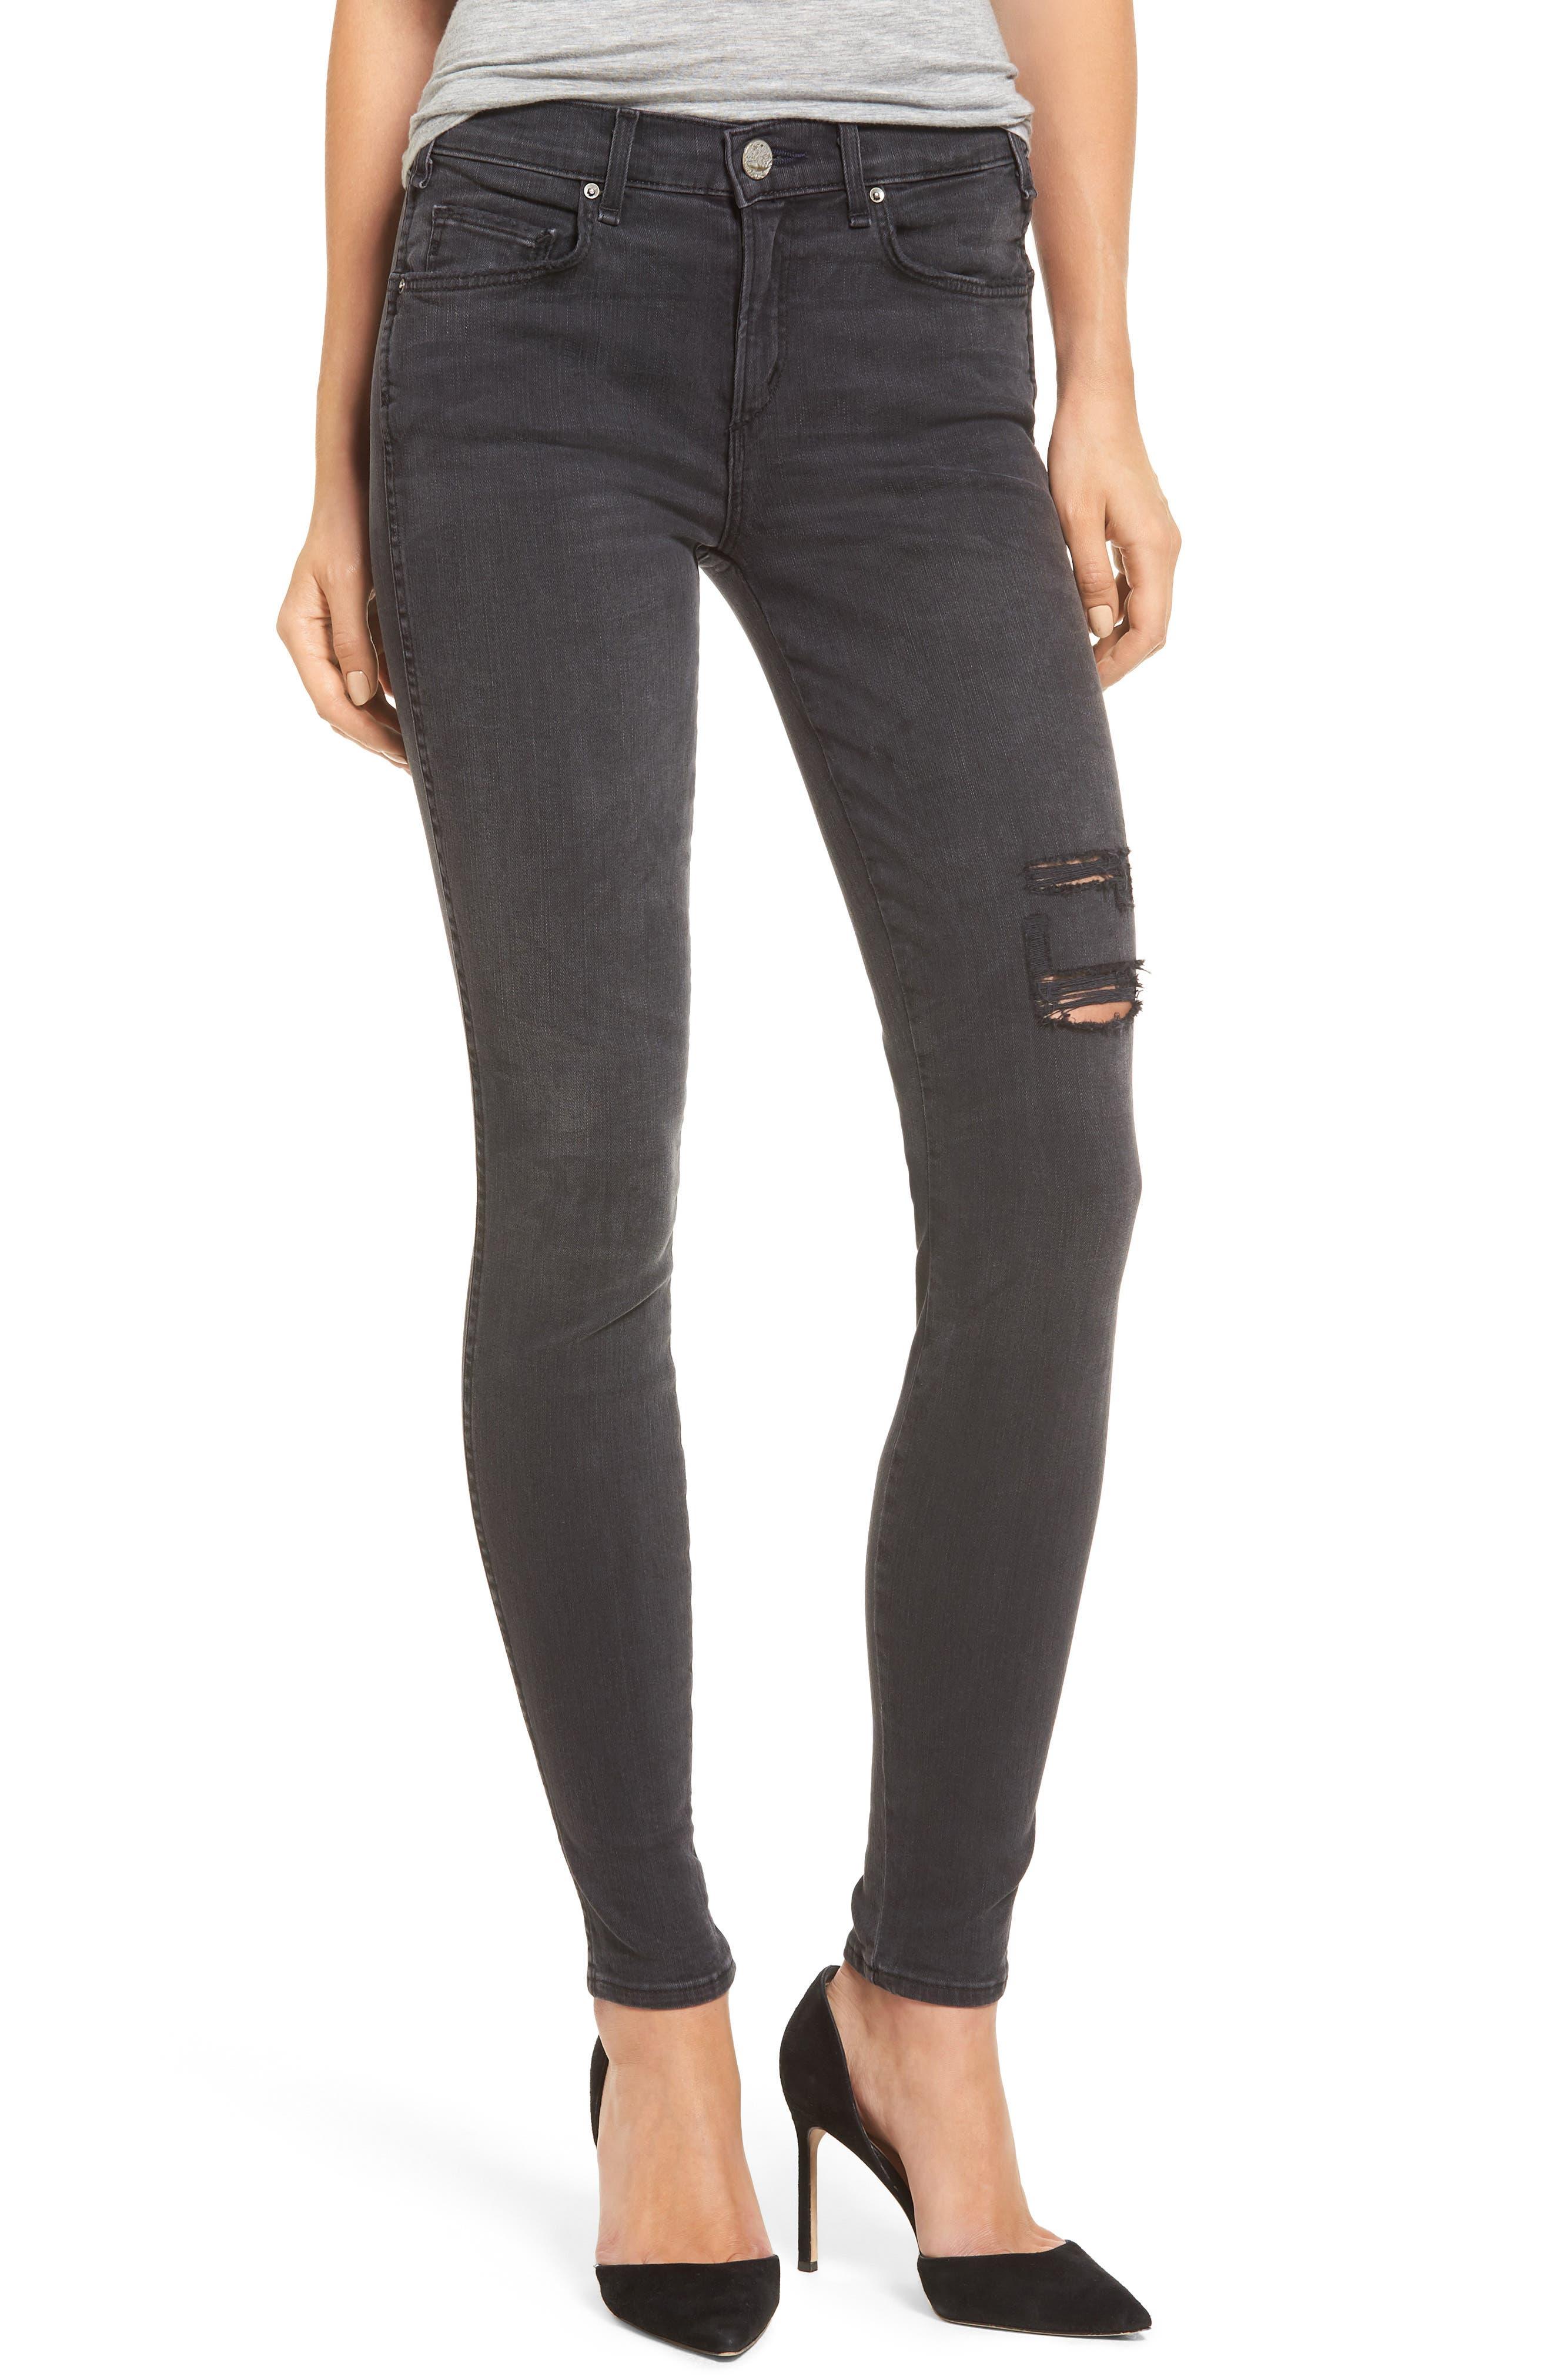 Newton Skinny Jeans,                         Main,                         color, 011